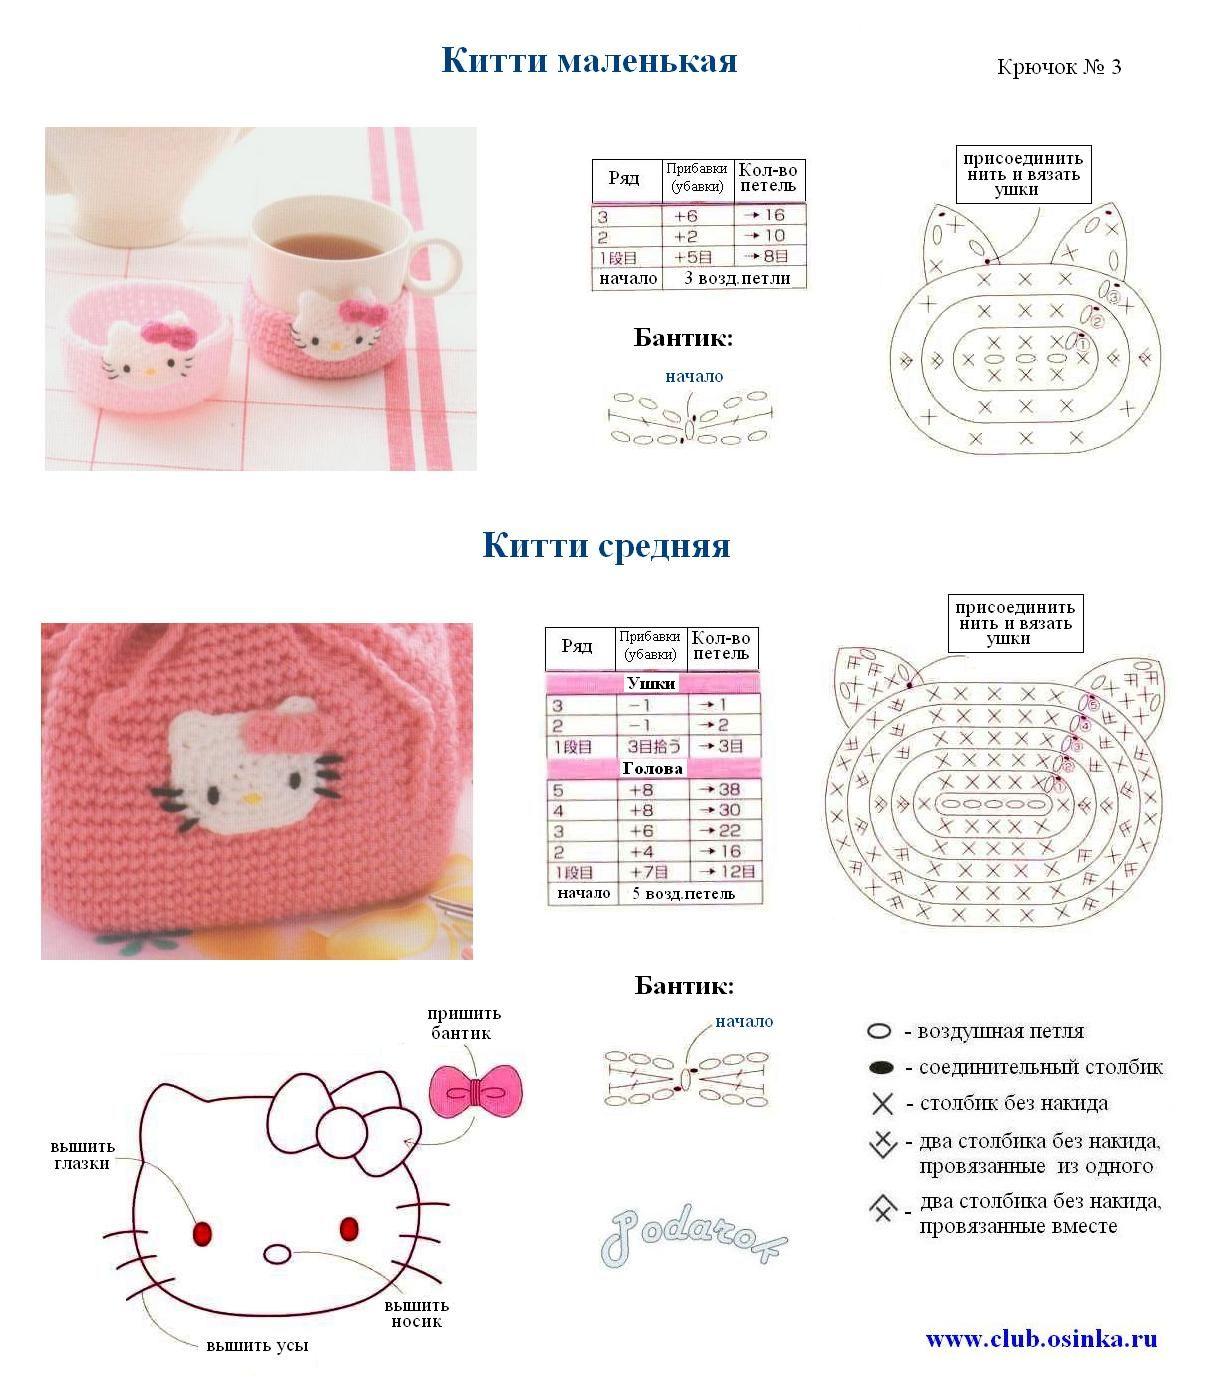 More hello kitty applique - chart only | crochet, patrones gratis ...